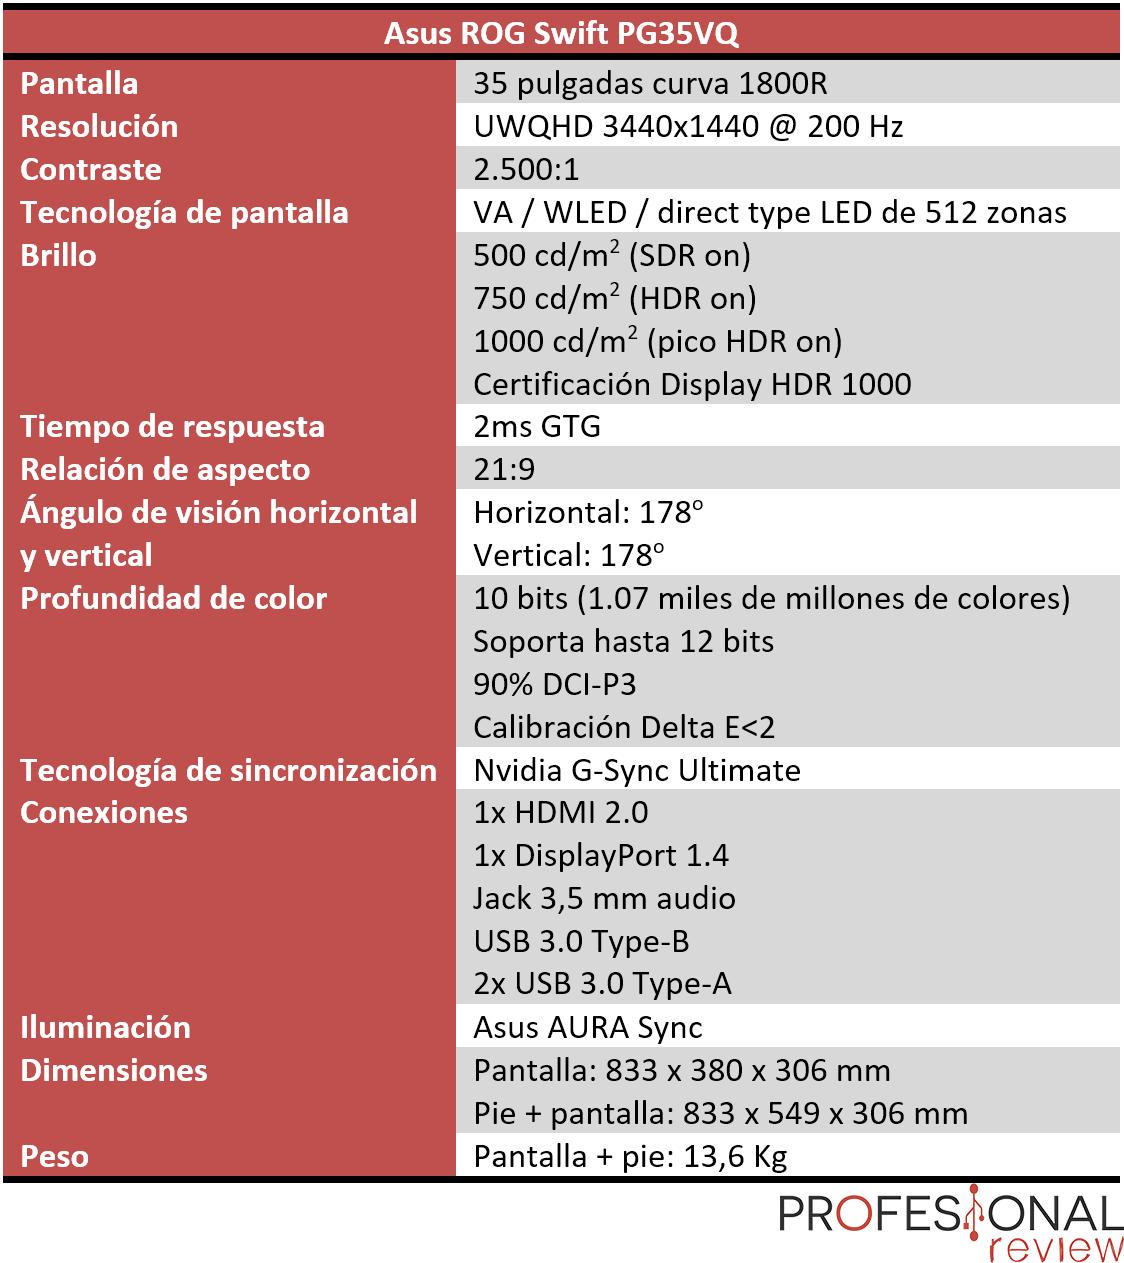 Asus ROG Swift PG35VQ Review en Español (Análisis completo)